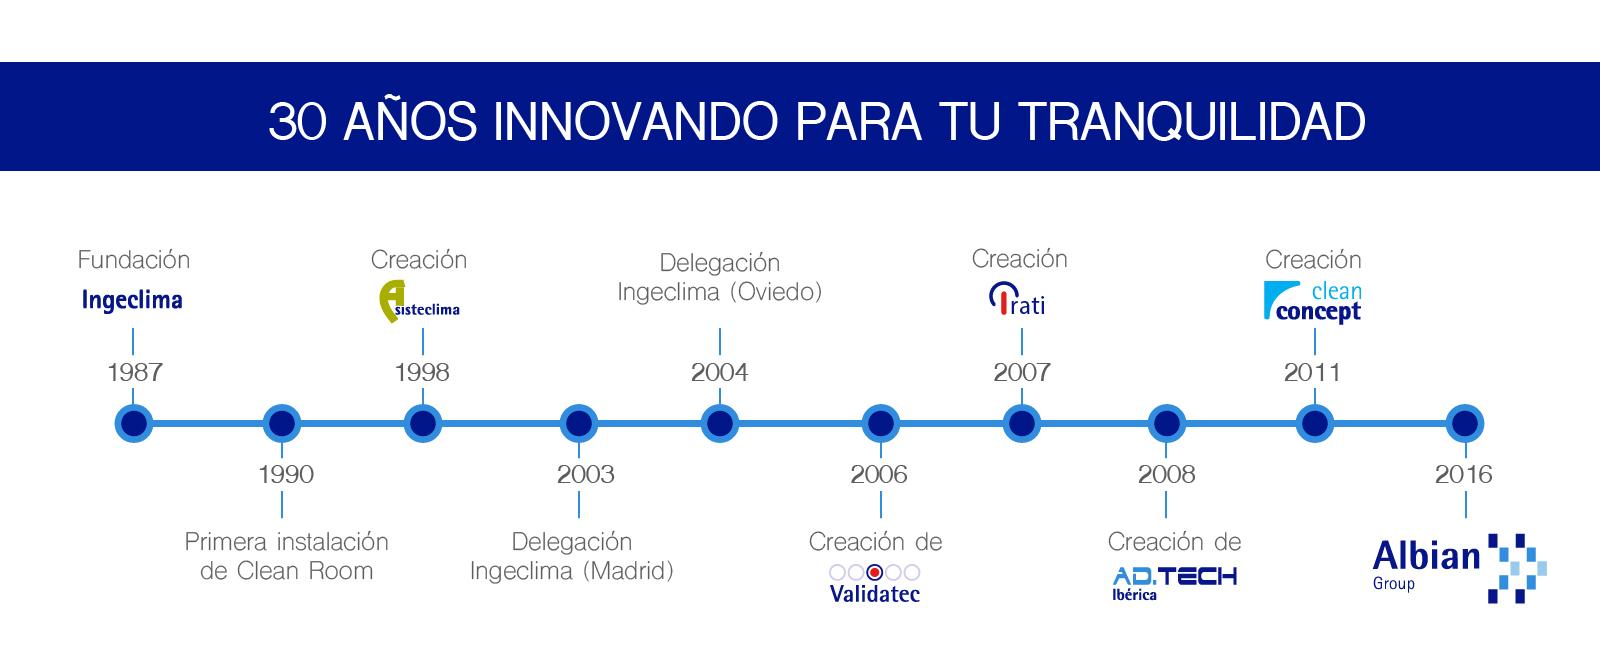 30_annos_innovando-01